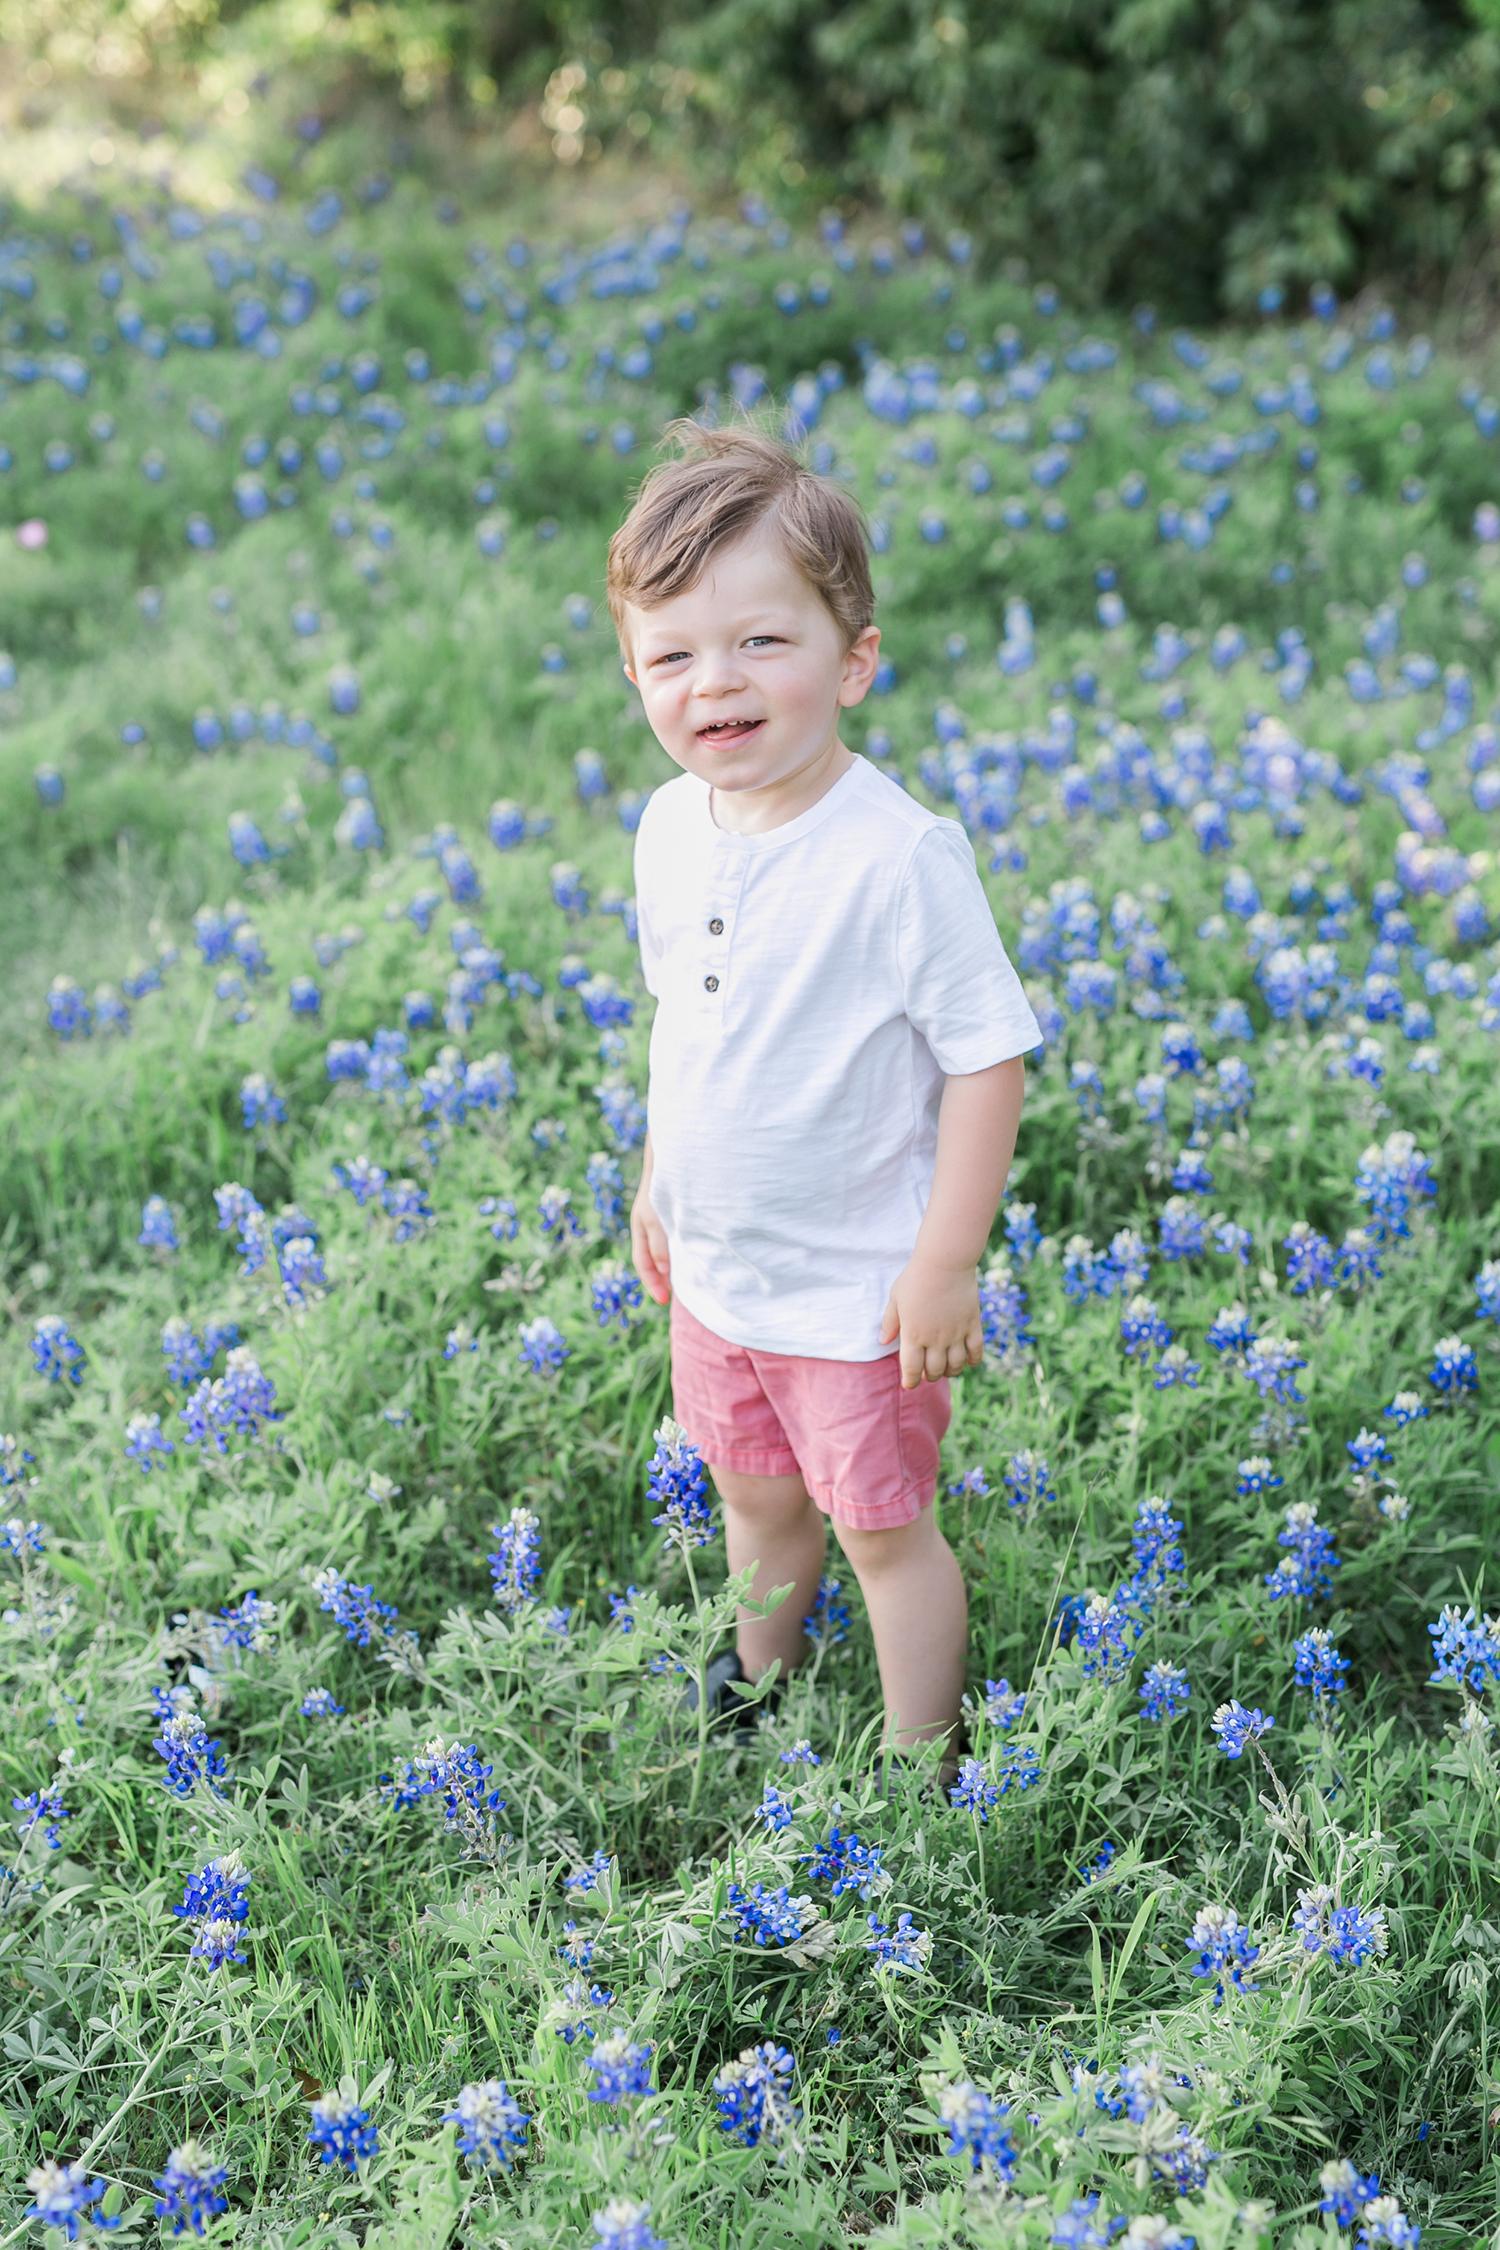 austin-bluebonnet-wildflower-photographer-mini-portraits-06.jpg